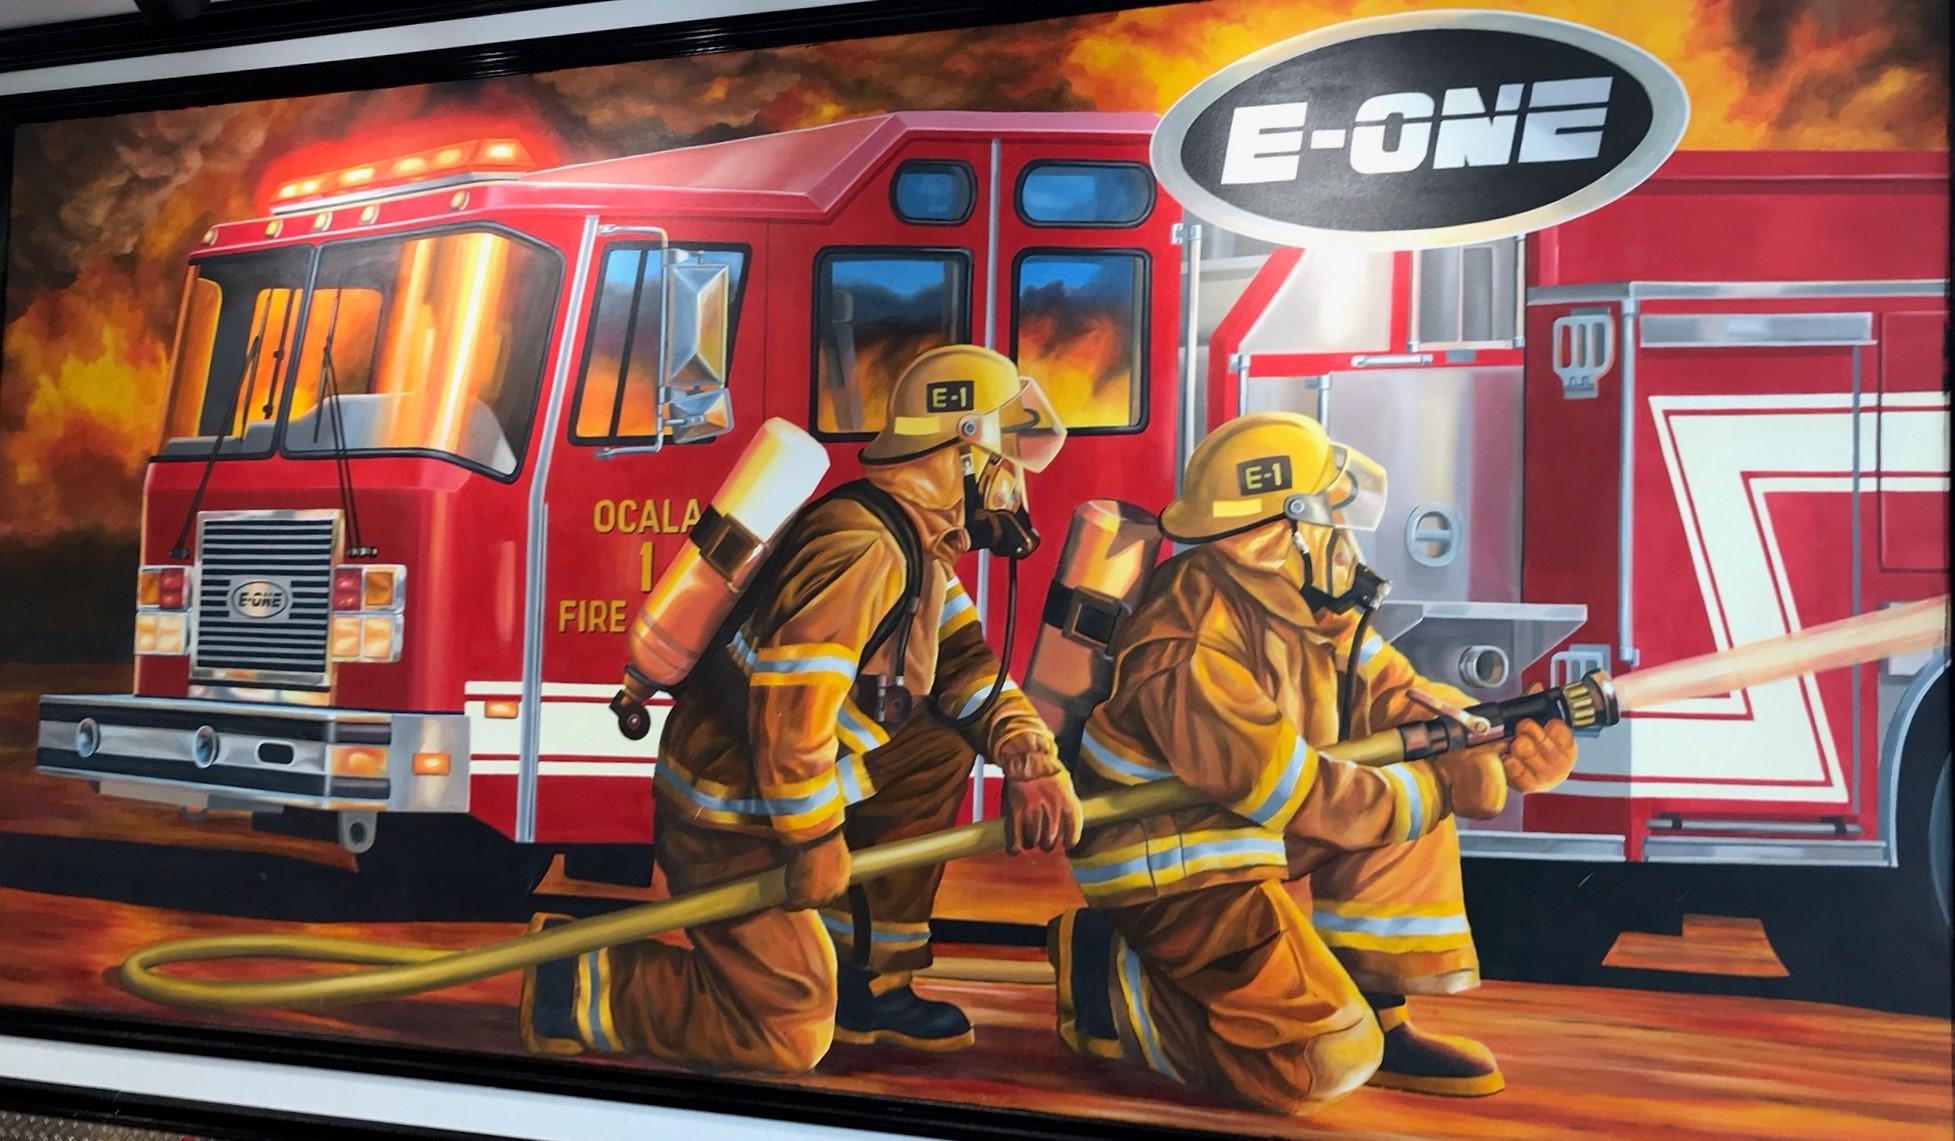 09-02-2020 Fire House Subs - Ocala